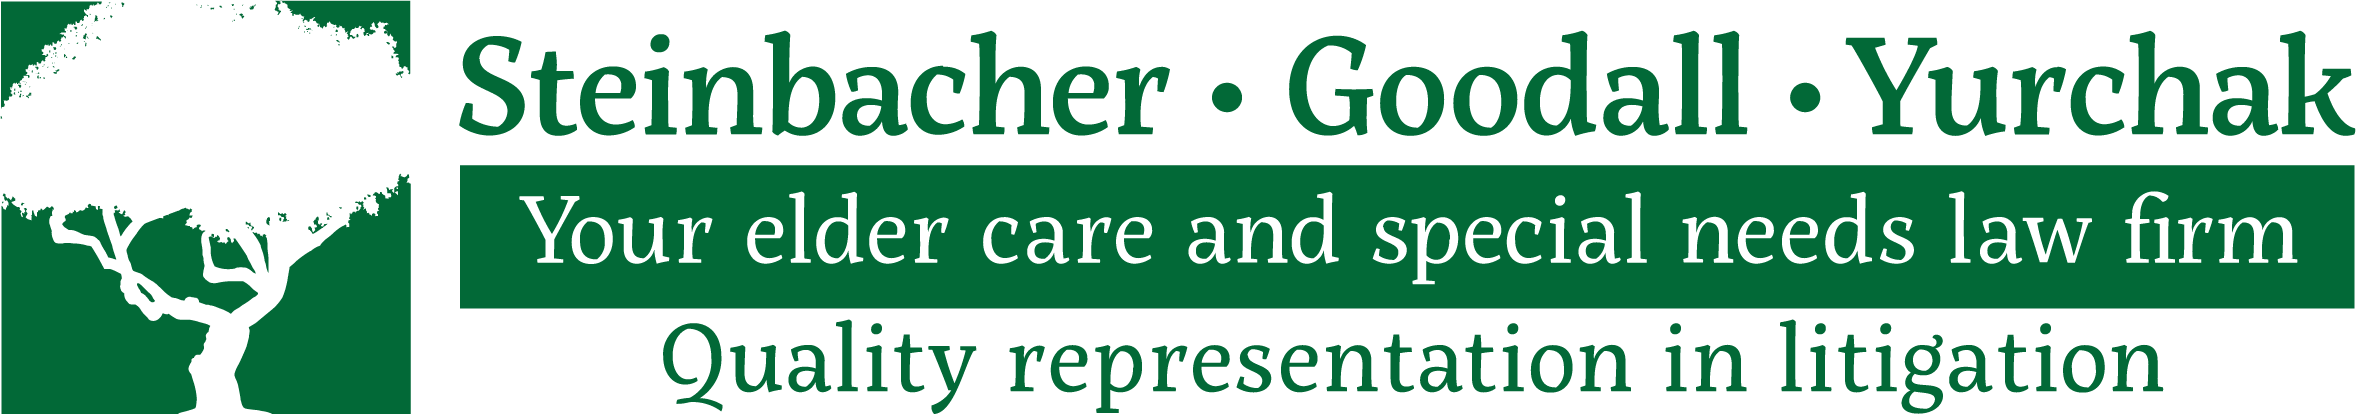 Steinbacher, Goodall & Yurchak logo